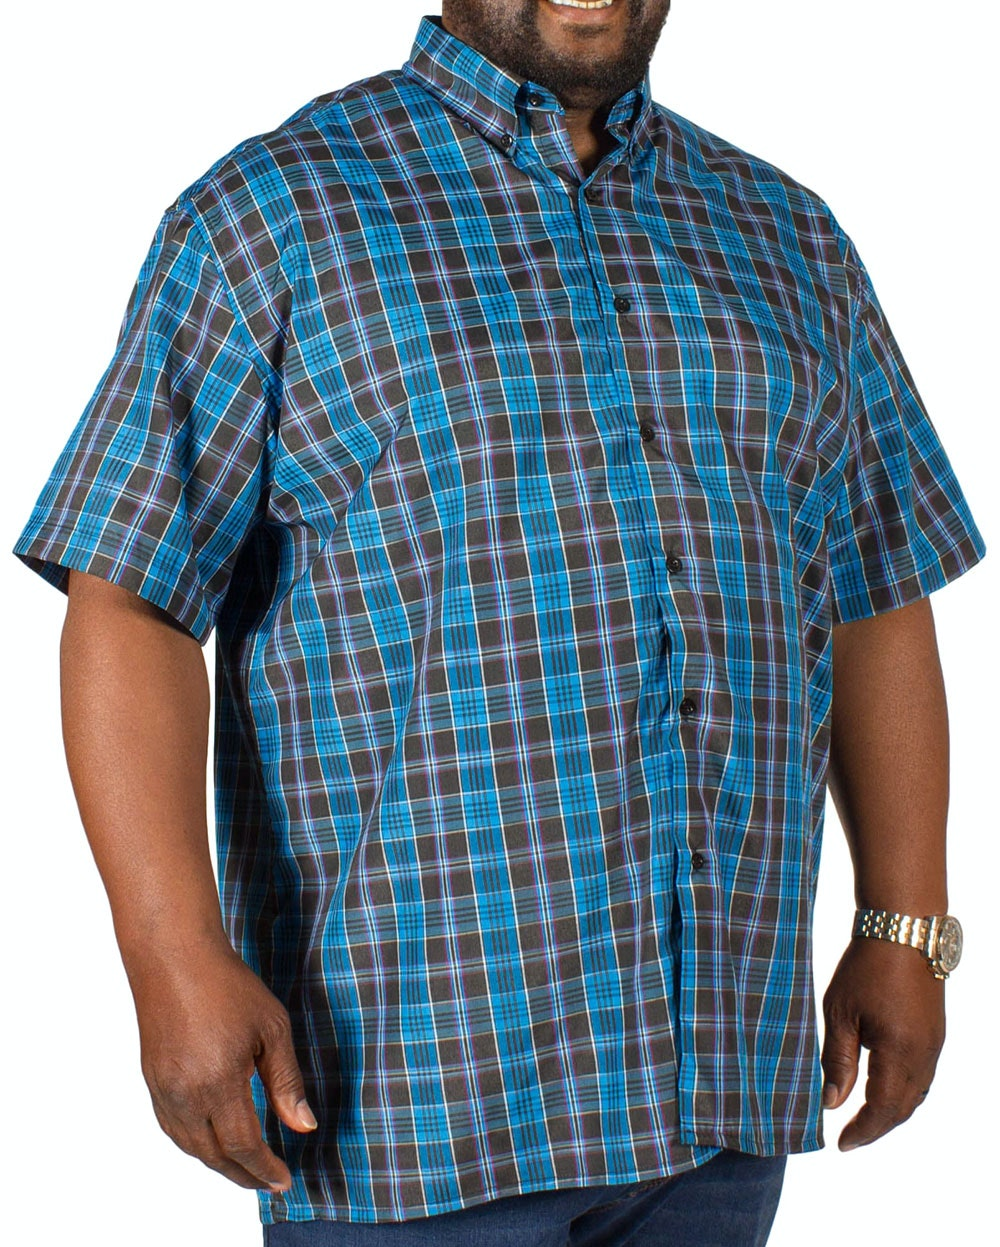 Fitzgerald Jamie Check Shirt Blue/Black